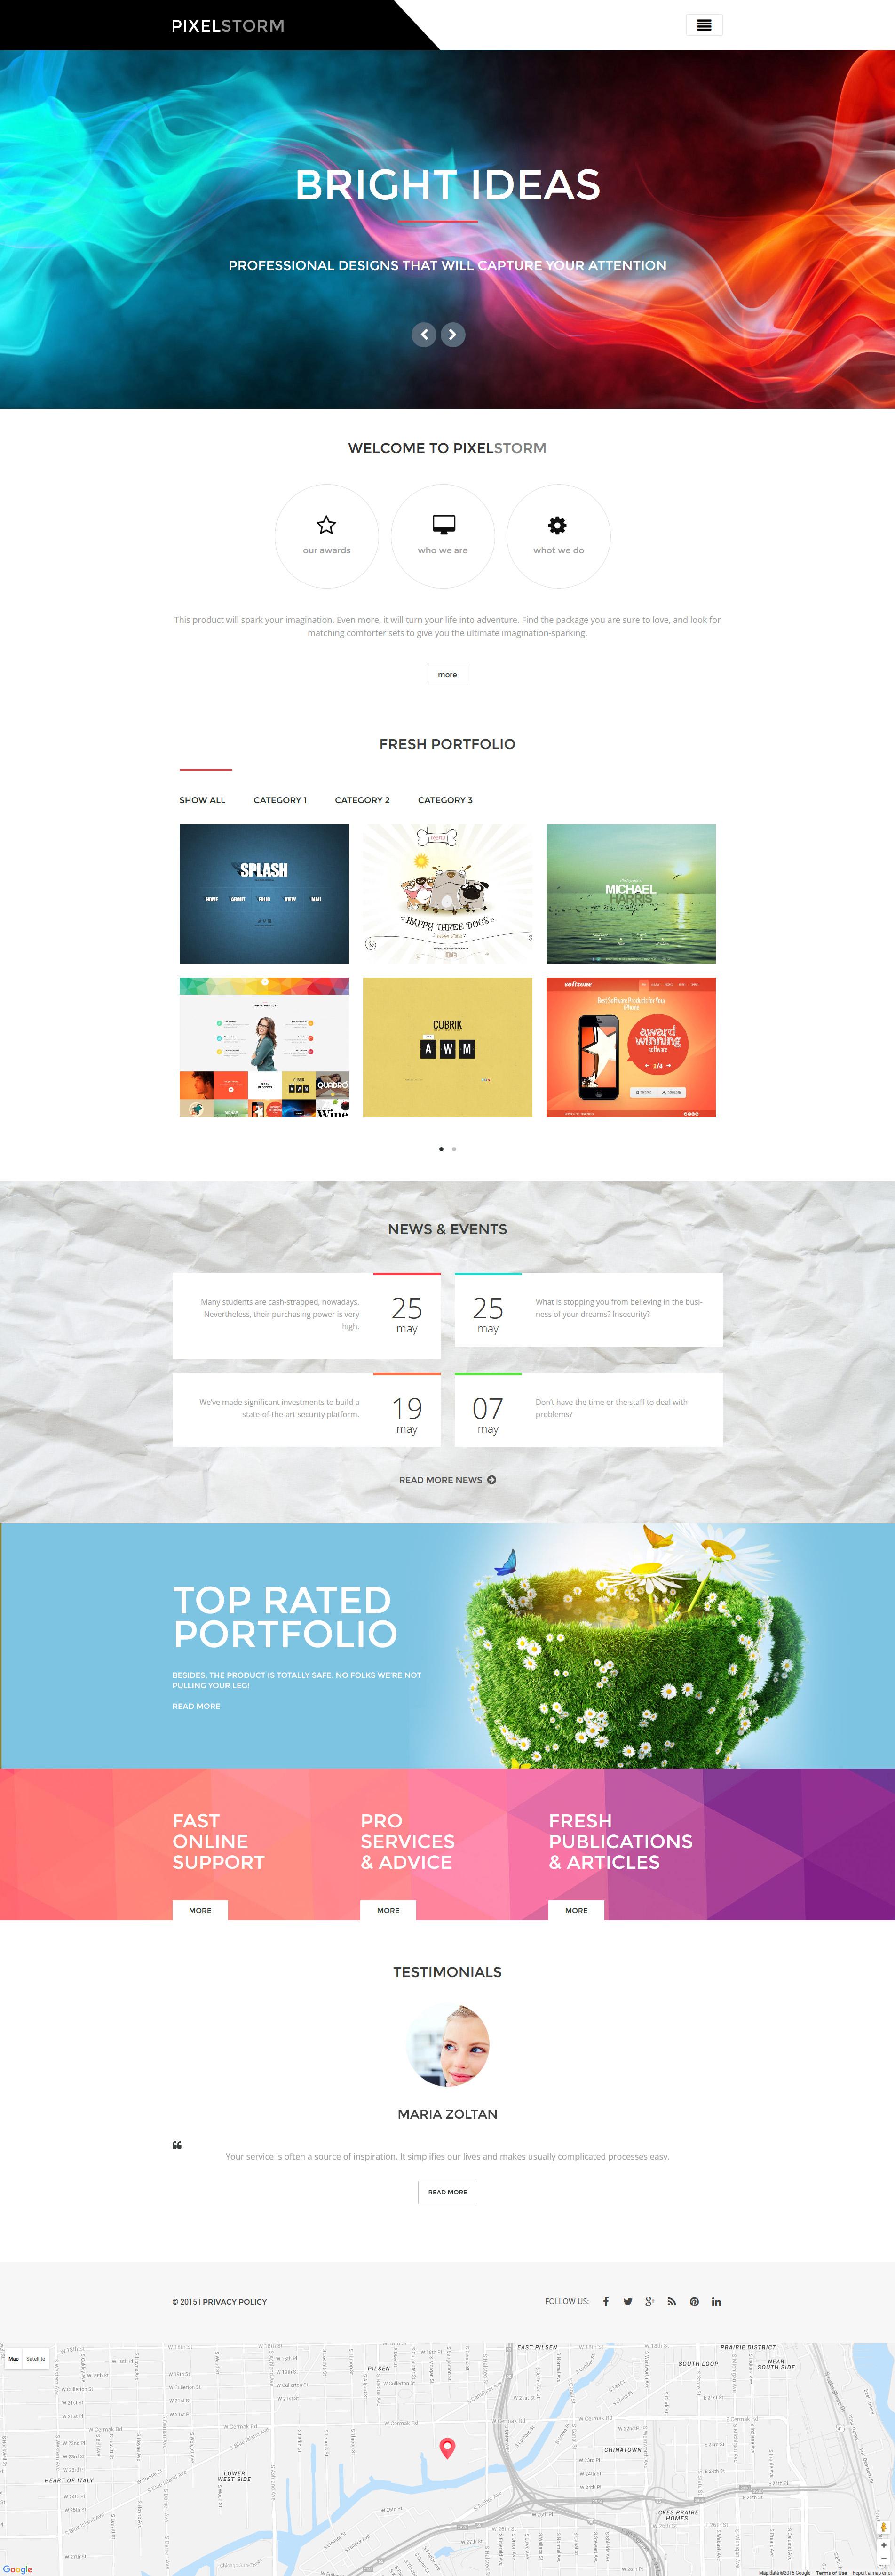 Pixel Storm WordPress Theme - screenshot